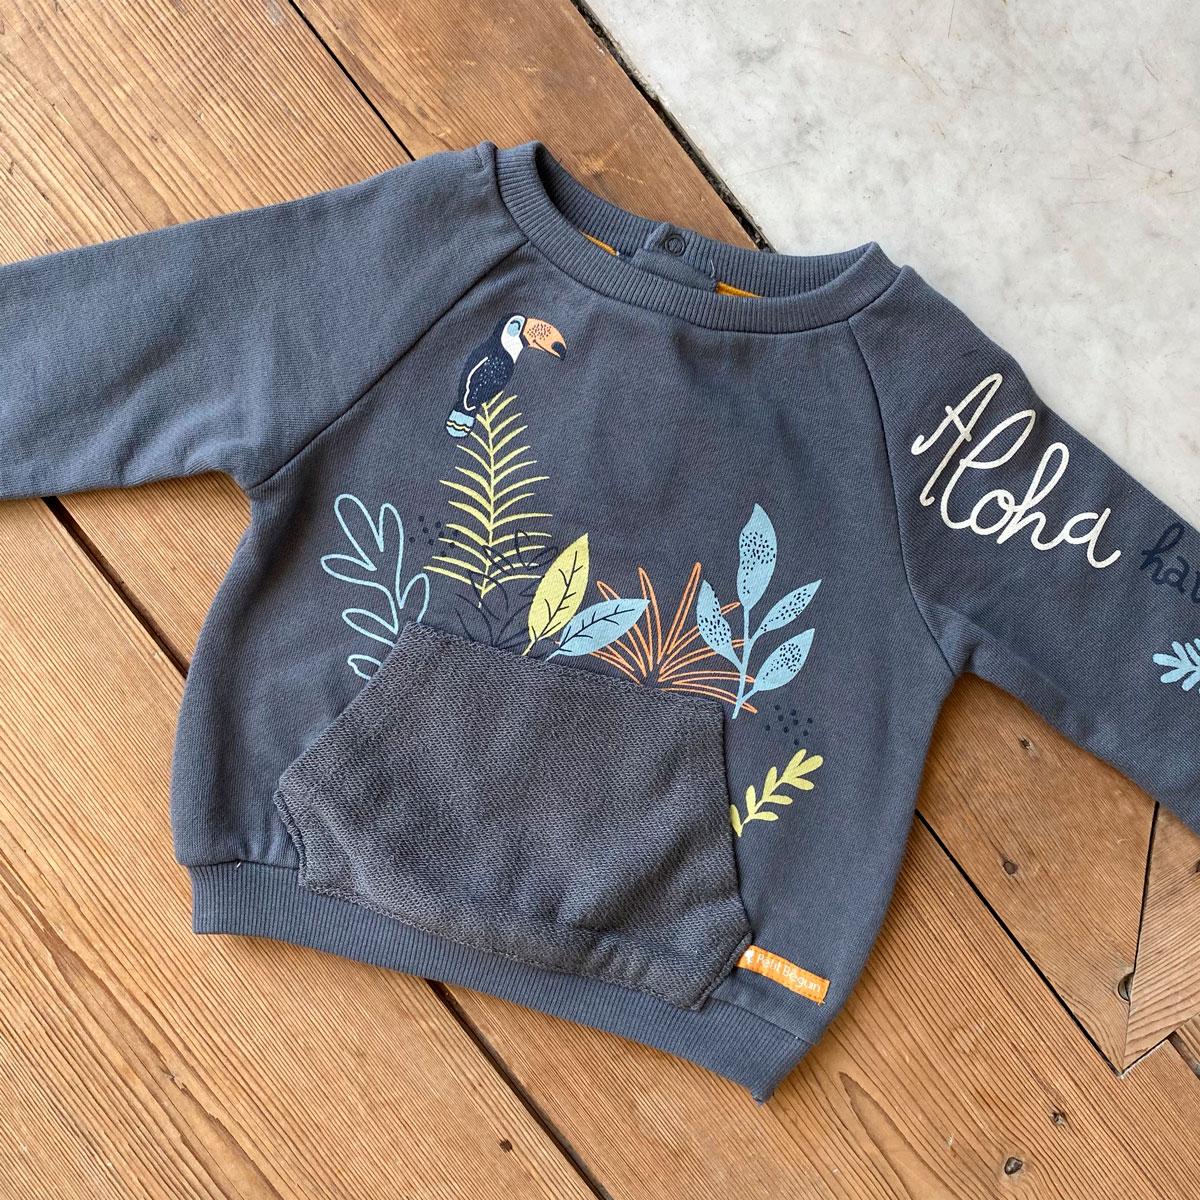 Sweat-shirt garçon contenant du coton gratté bio Aloha Havana insta